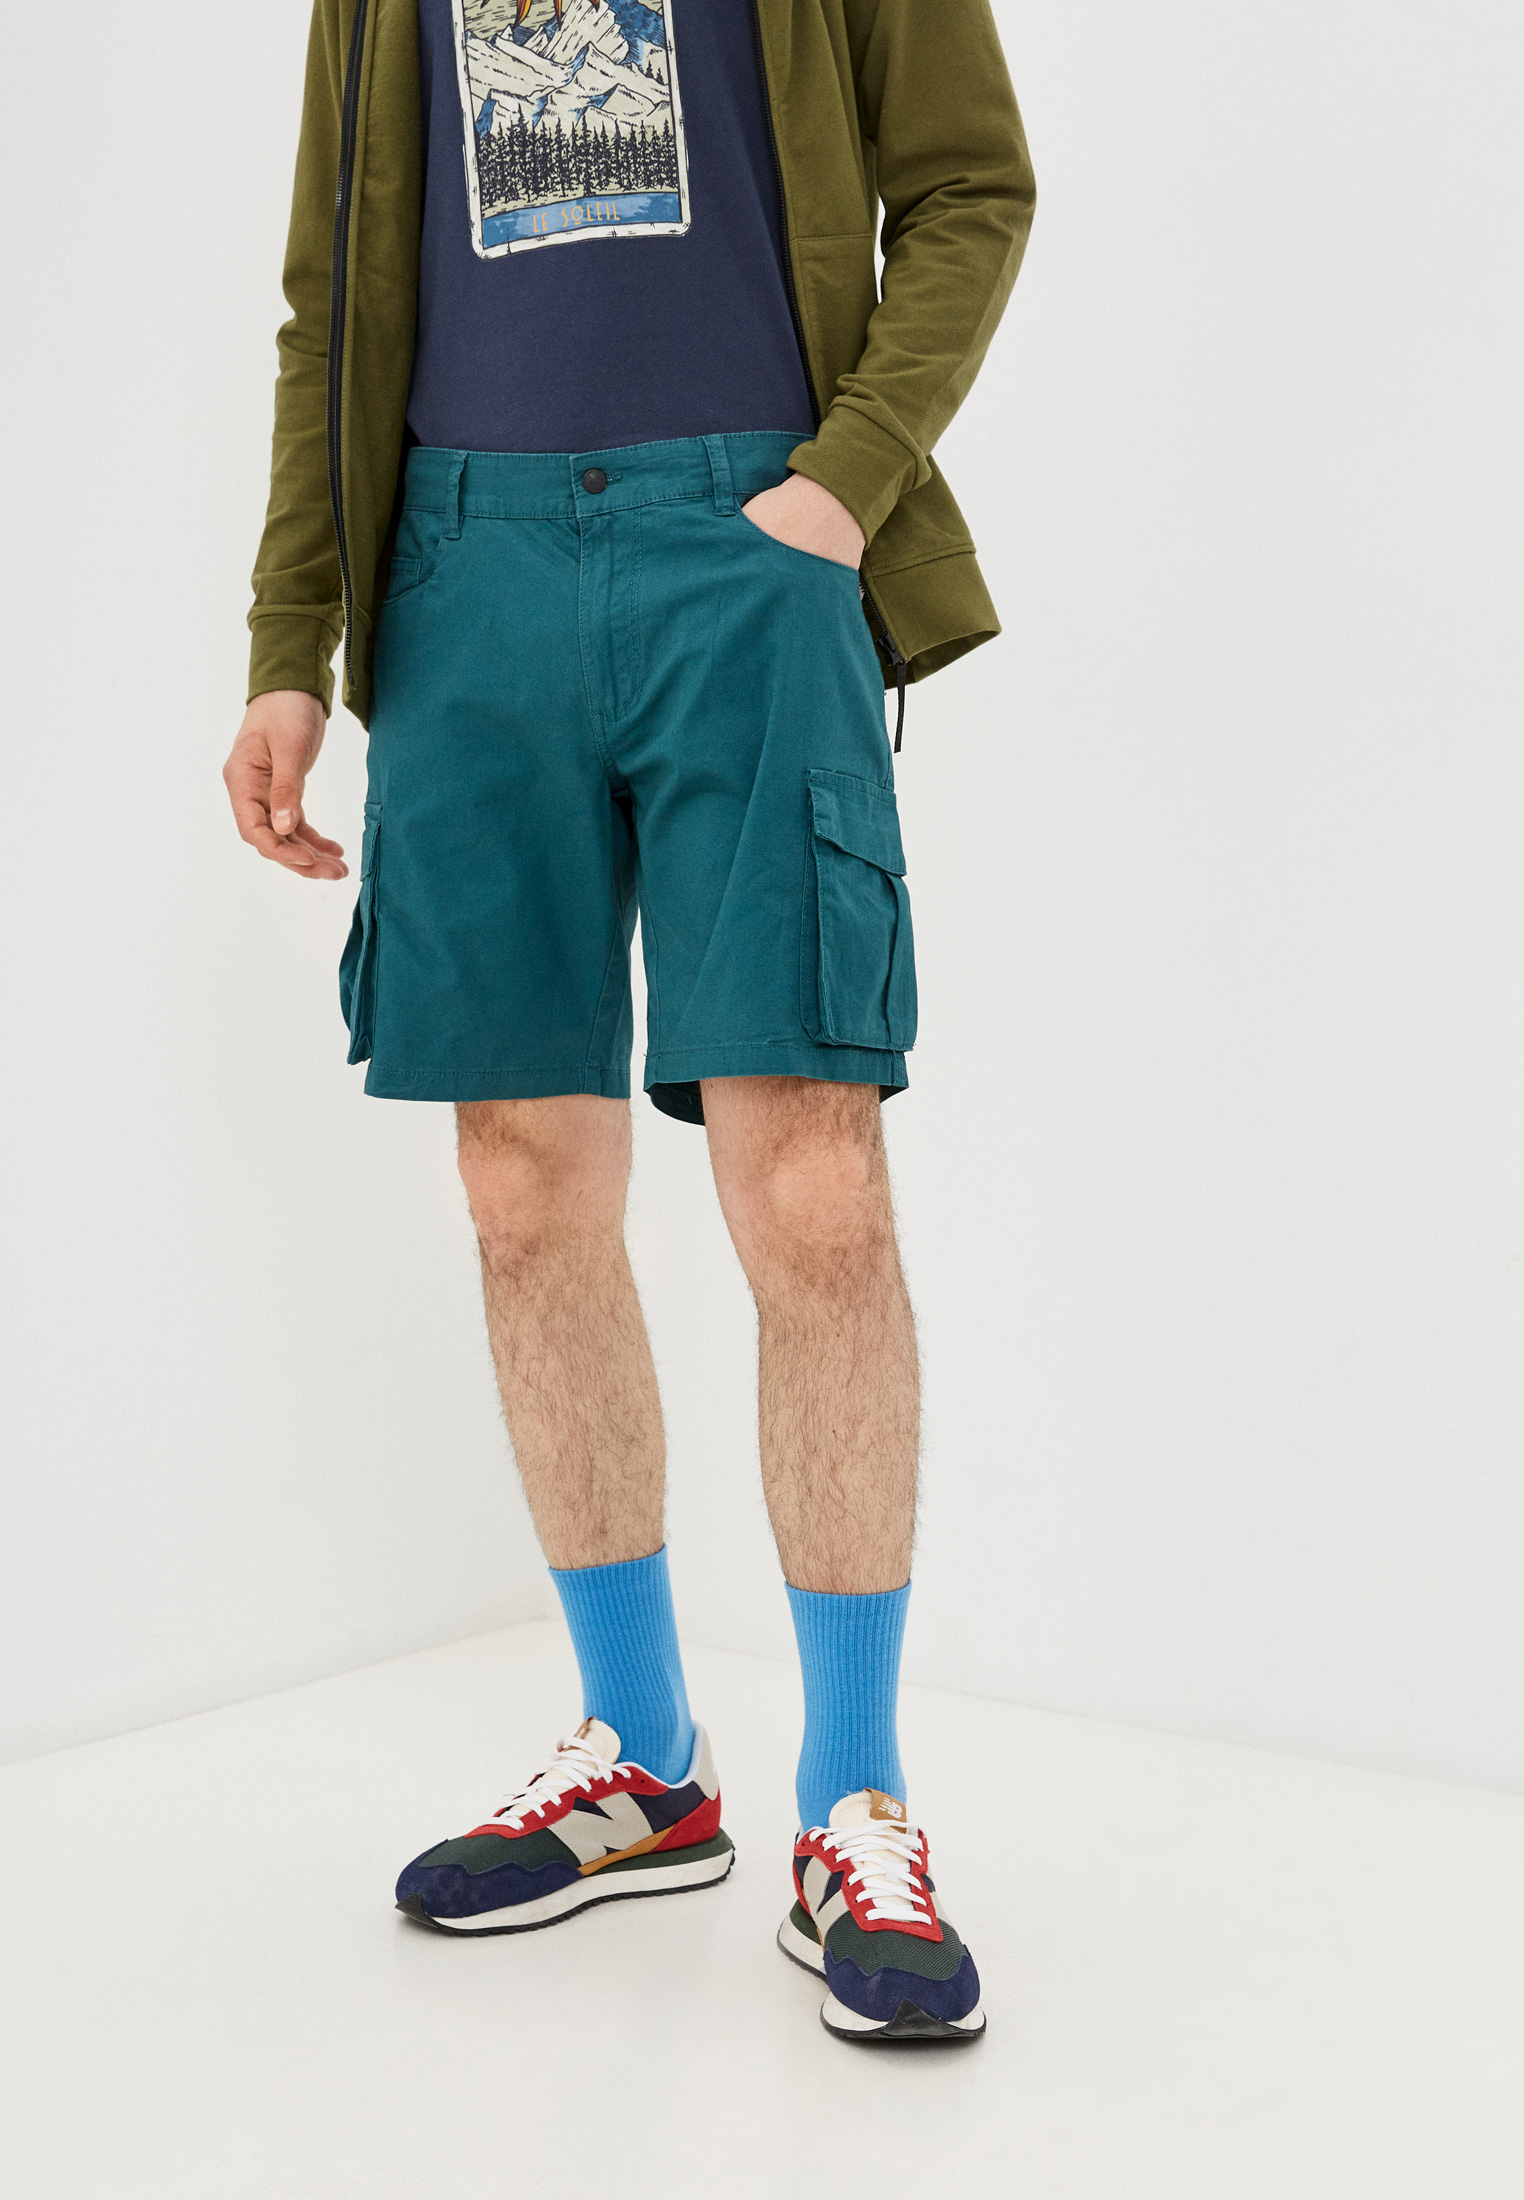 Мужские спортивные шорты Outhorn Шорты Outhorn